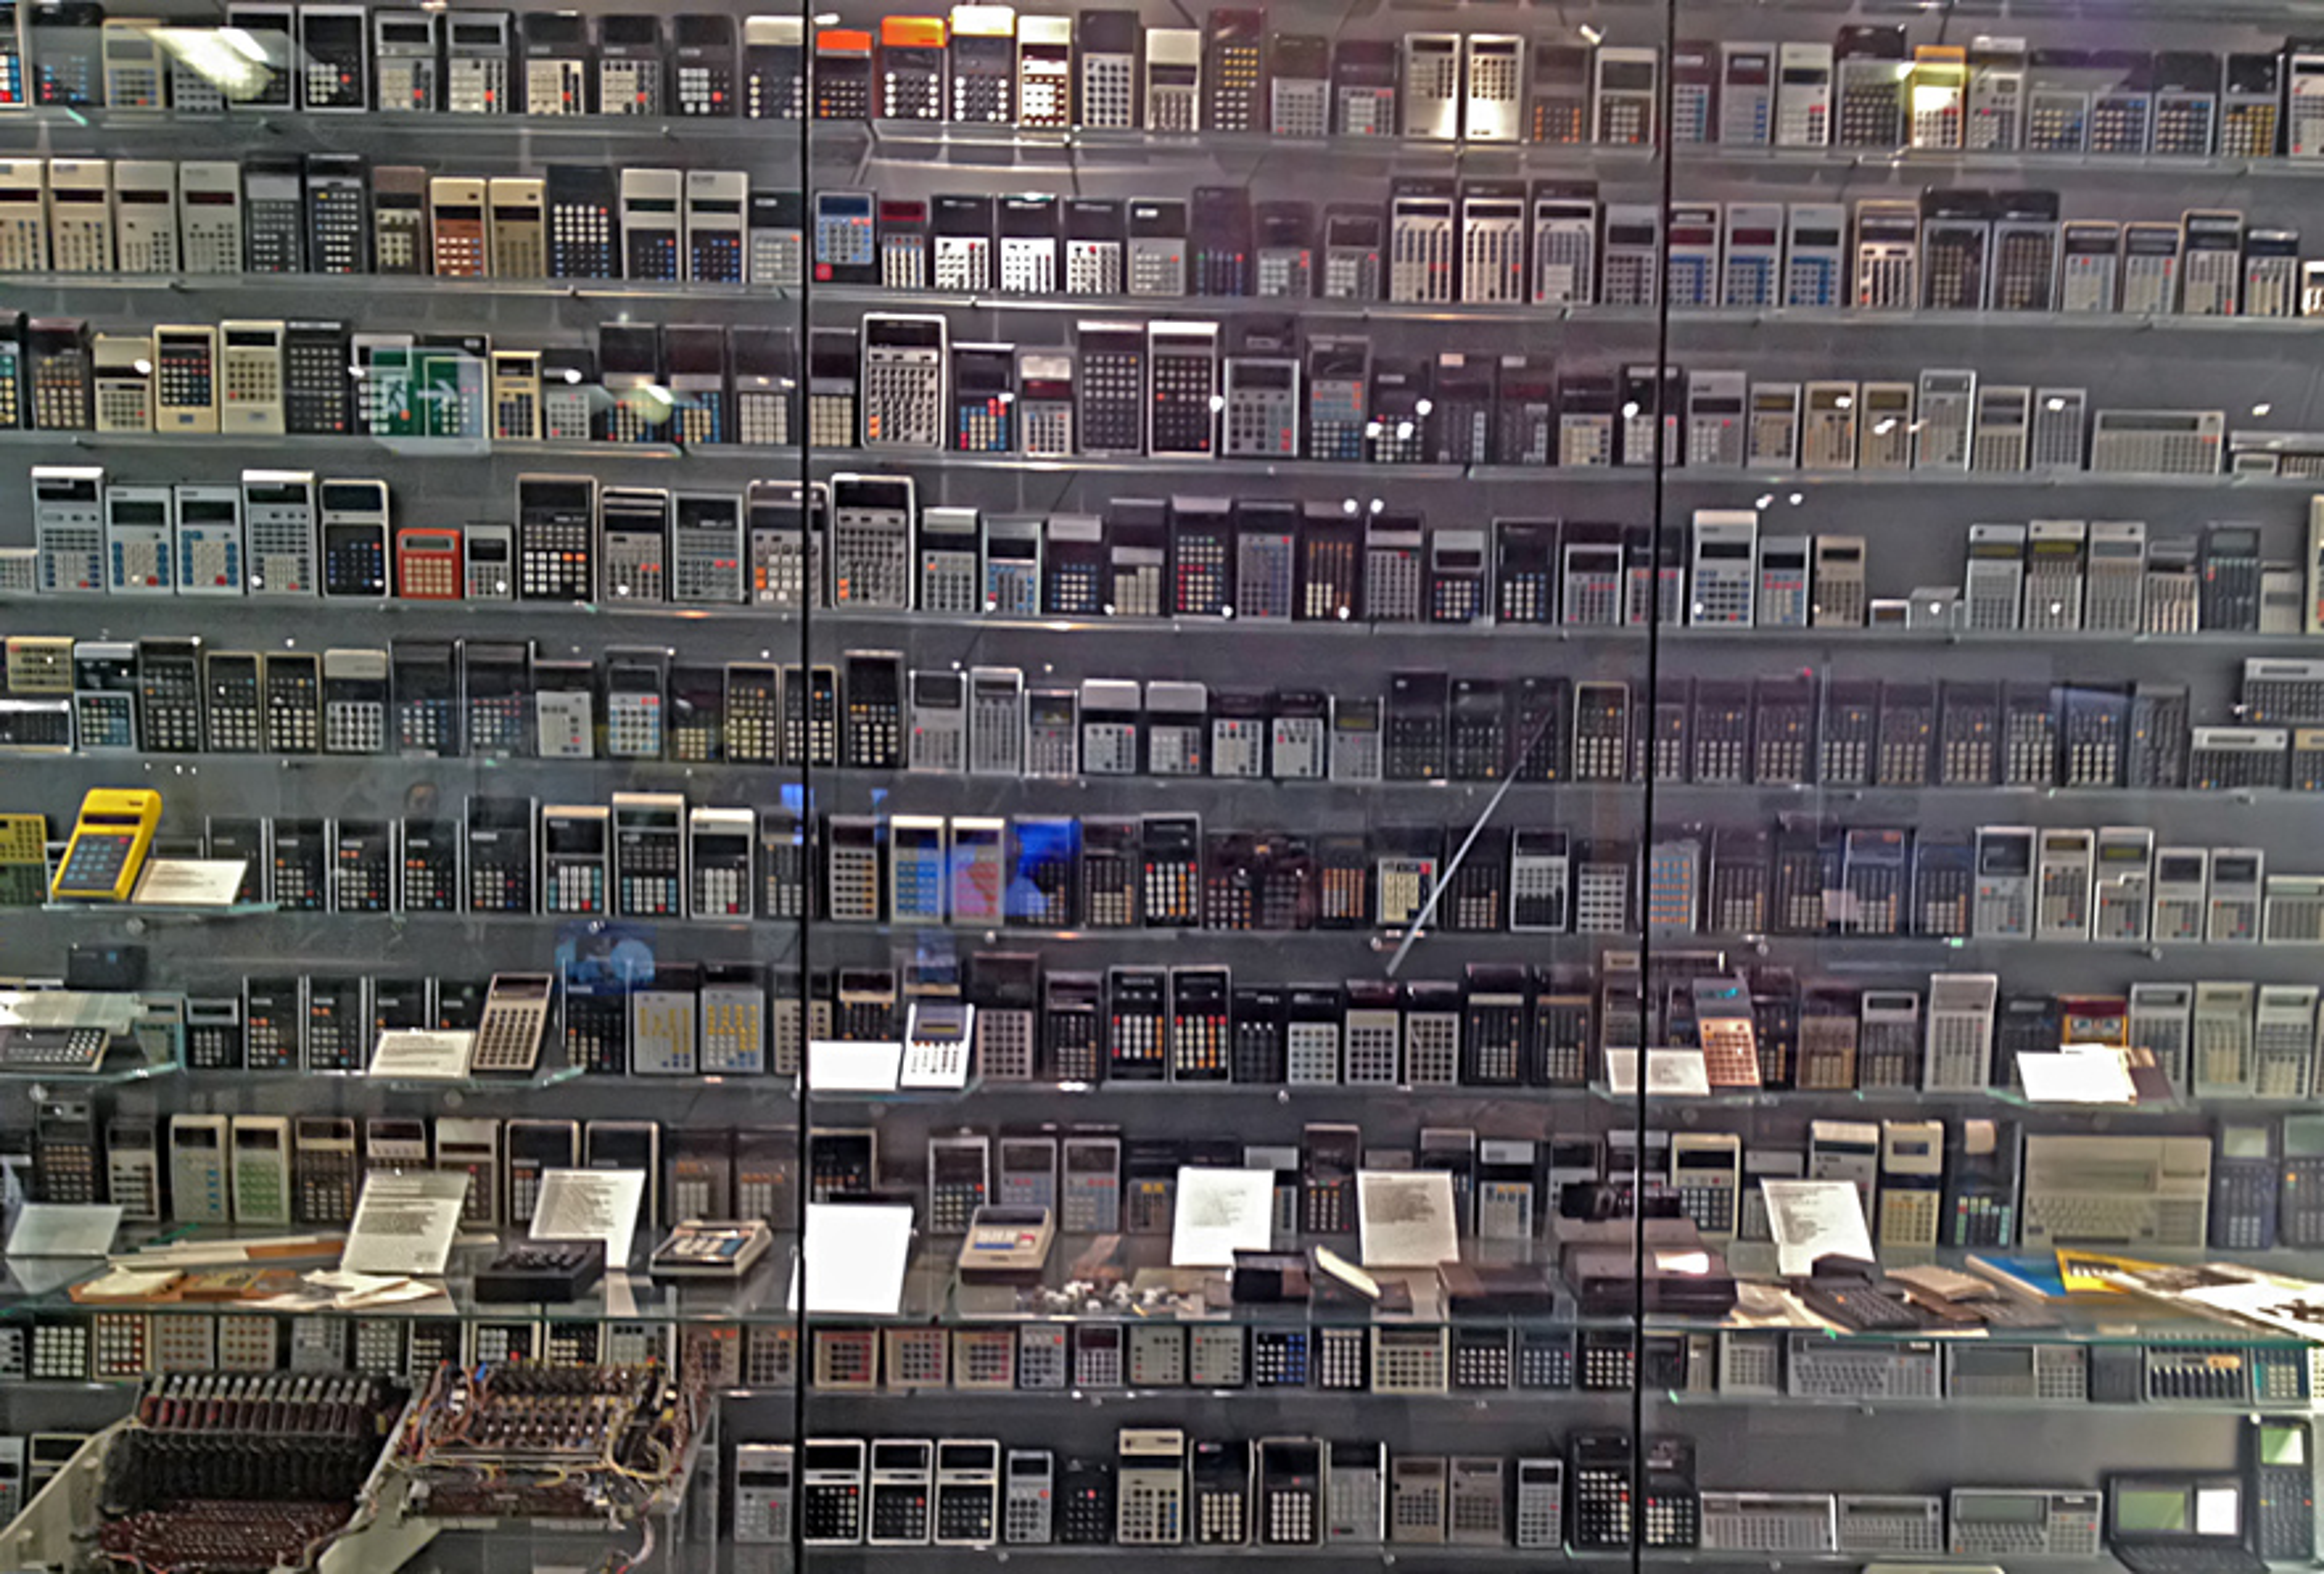 Paderborn Heinz Nixdorf Museum